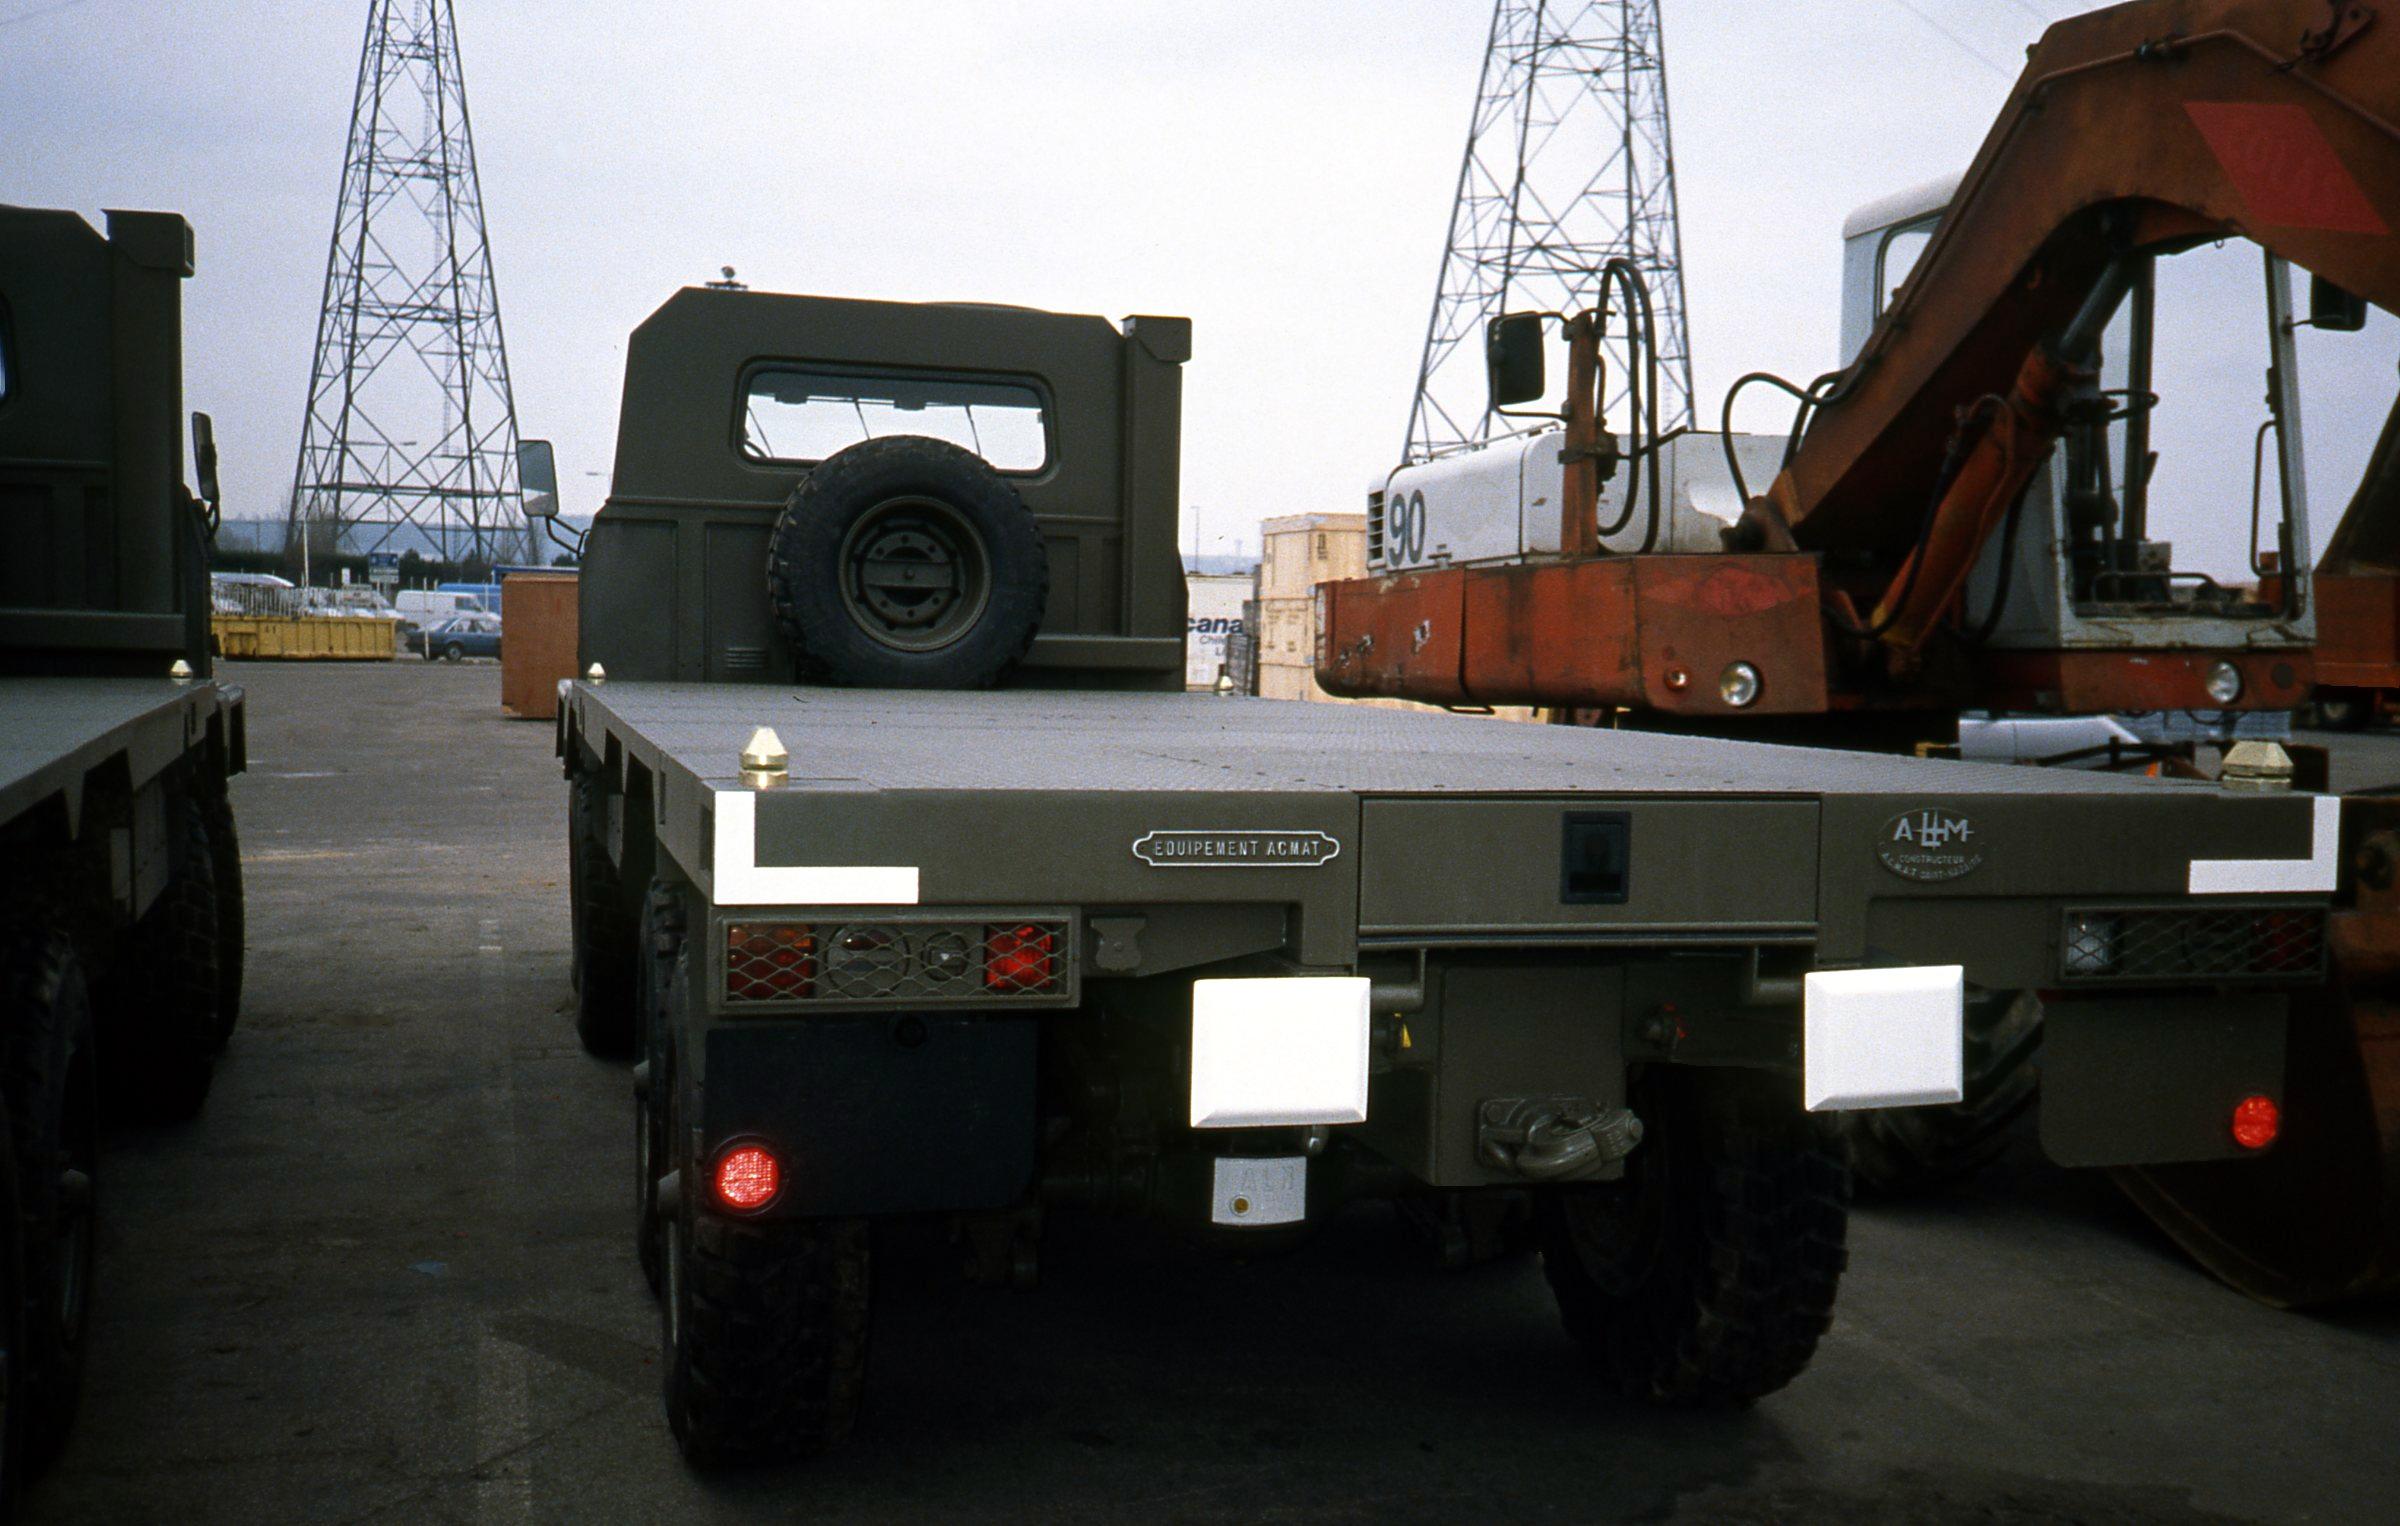 Photos - Logistique et Camions / Logistics and Trucks - Page 6 34743675032_1522ff126d_o